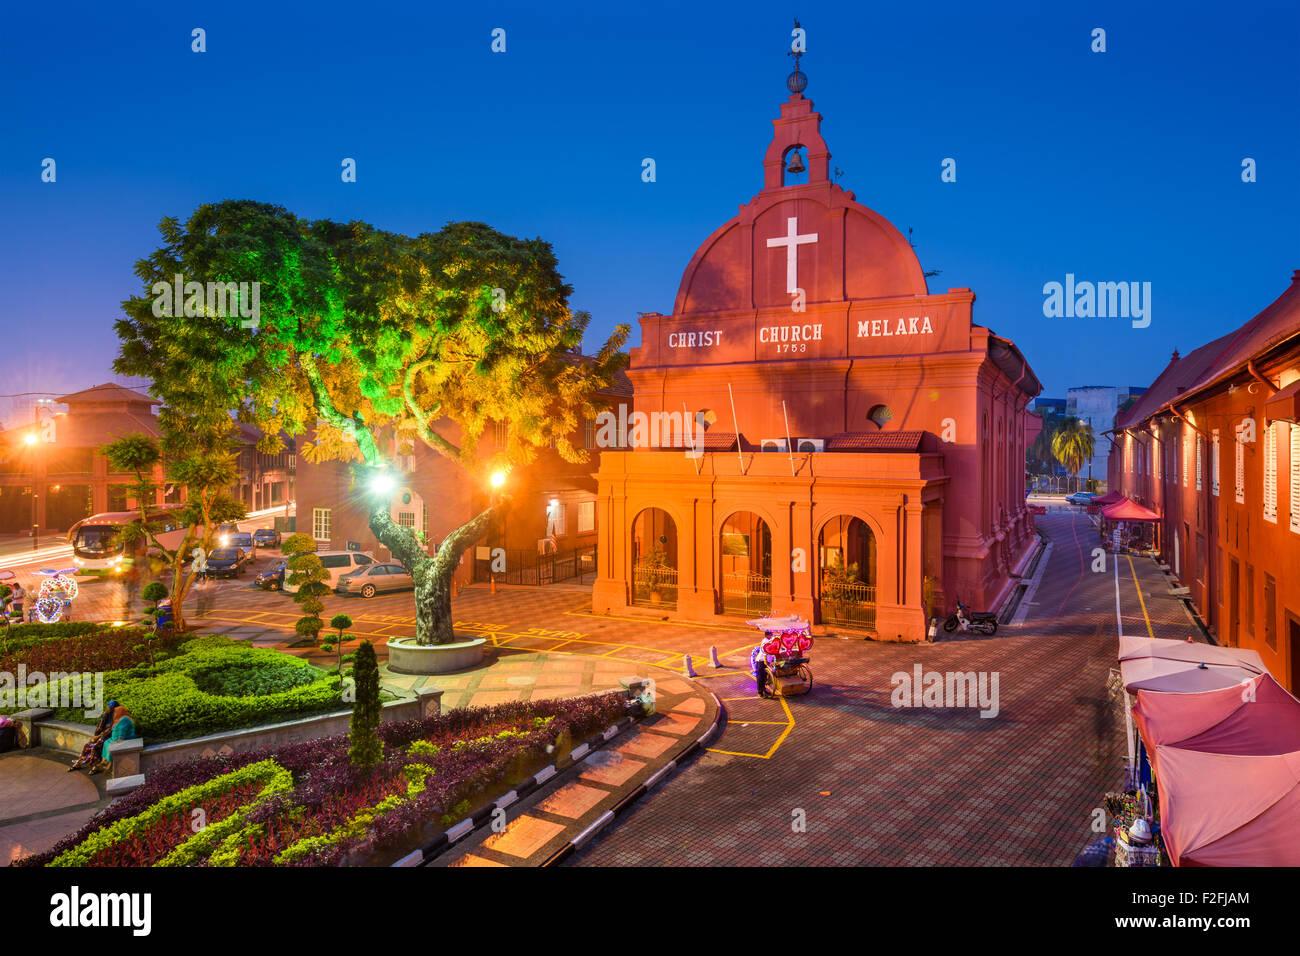 Christ Church Melaka in Malacca, Malaysia. - Stock Image